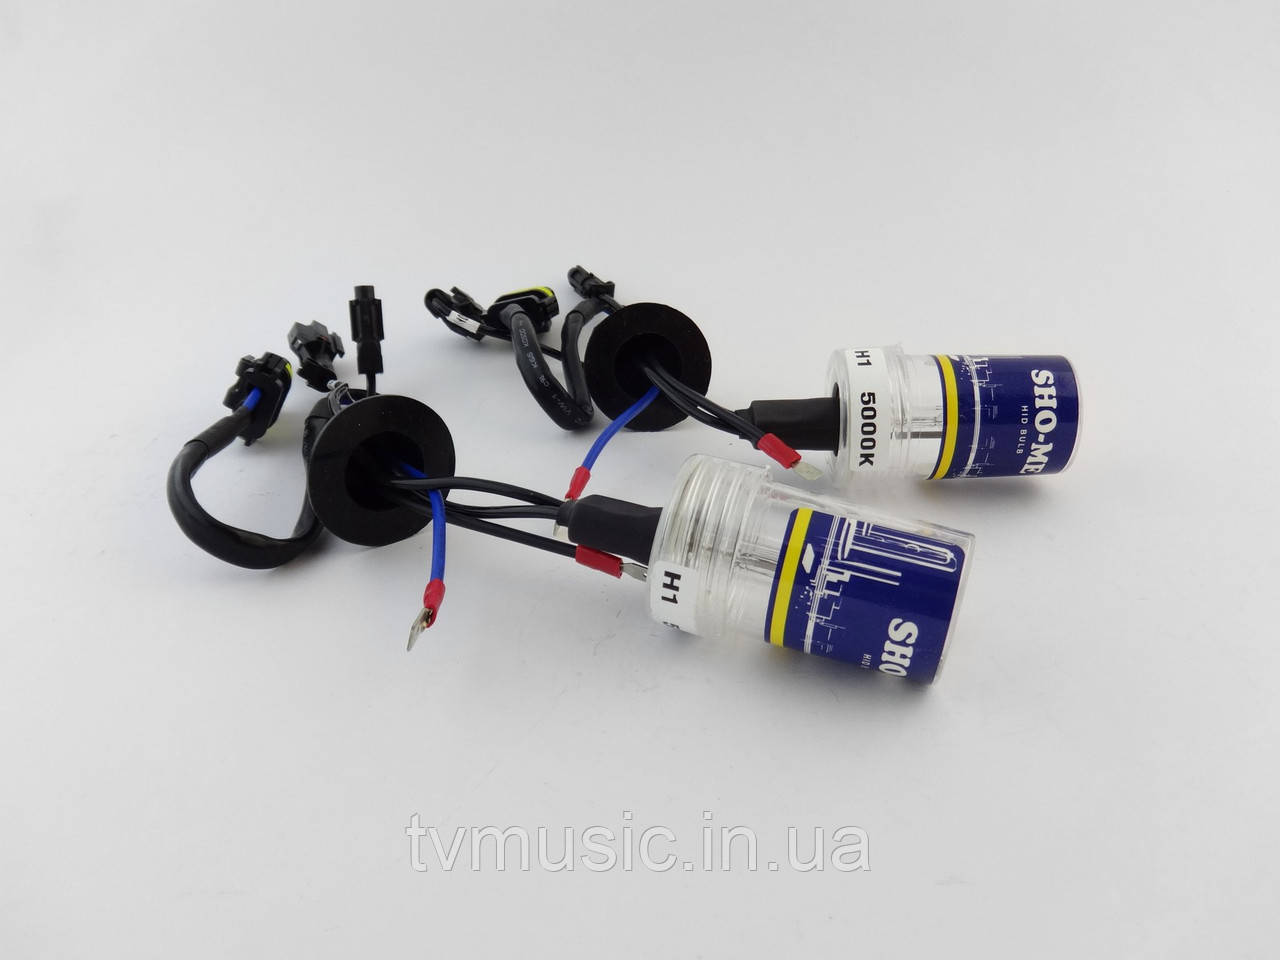 Ксеноновая лампа Sho Me HB4 (9006) 4300K 35W